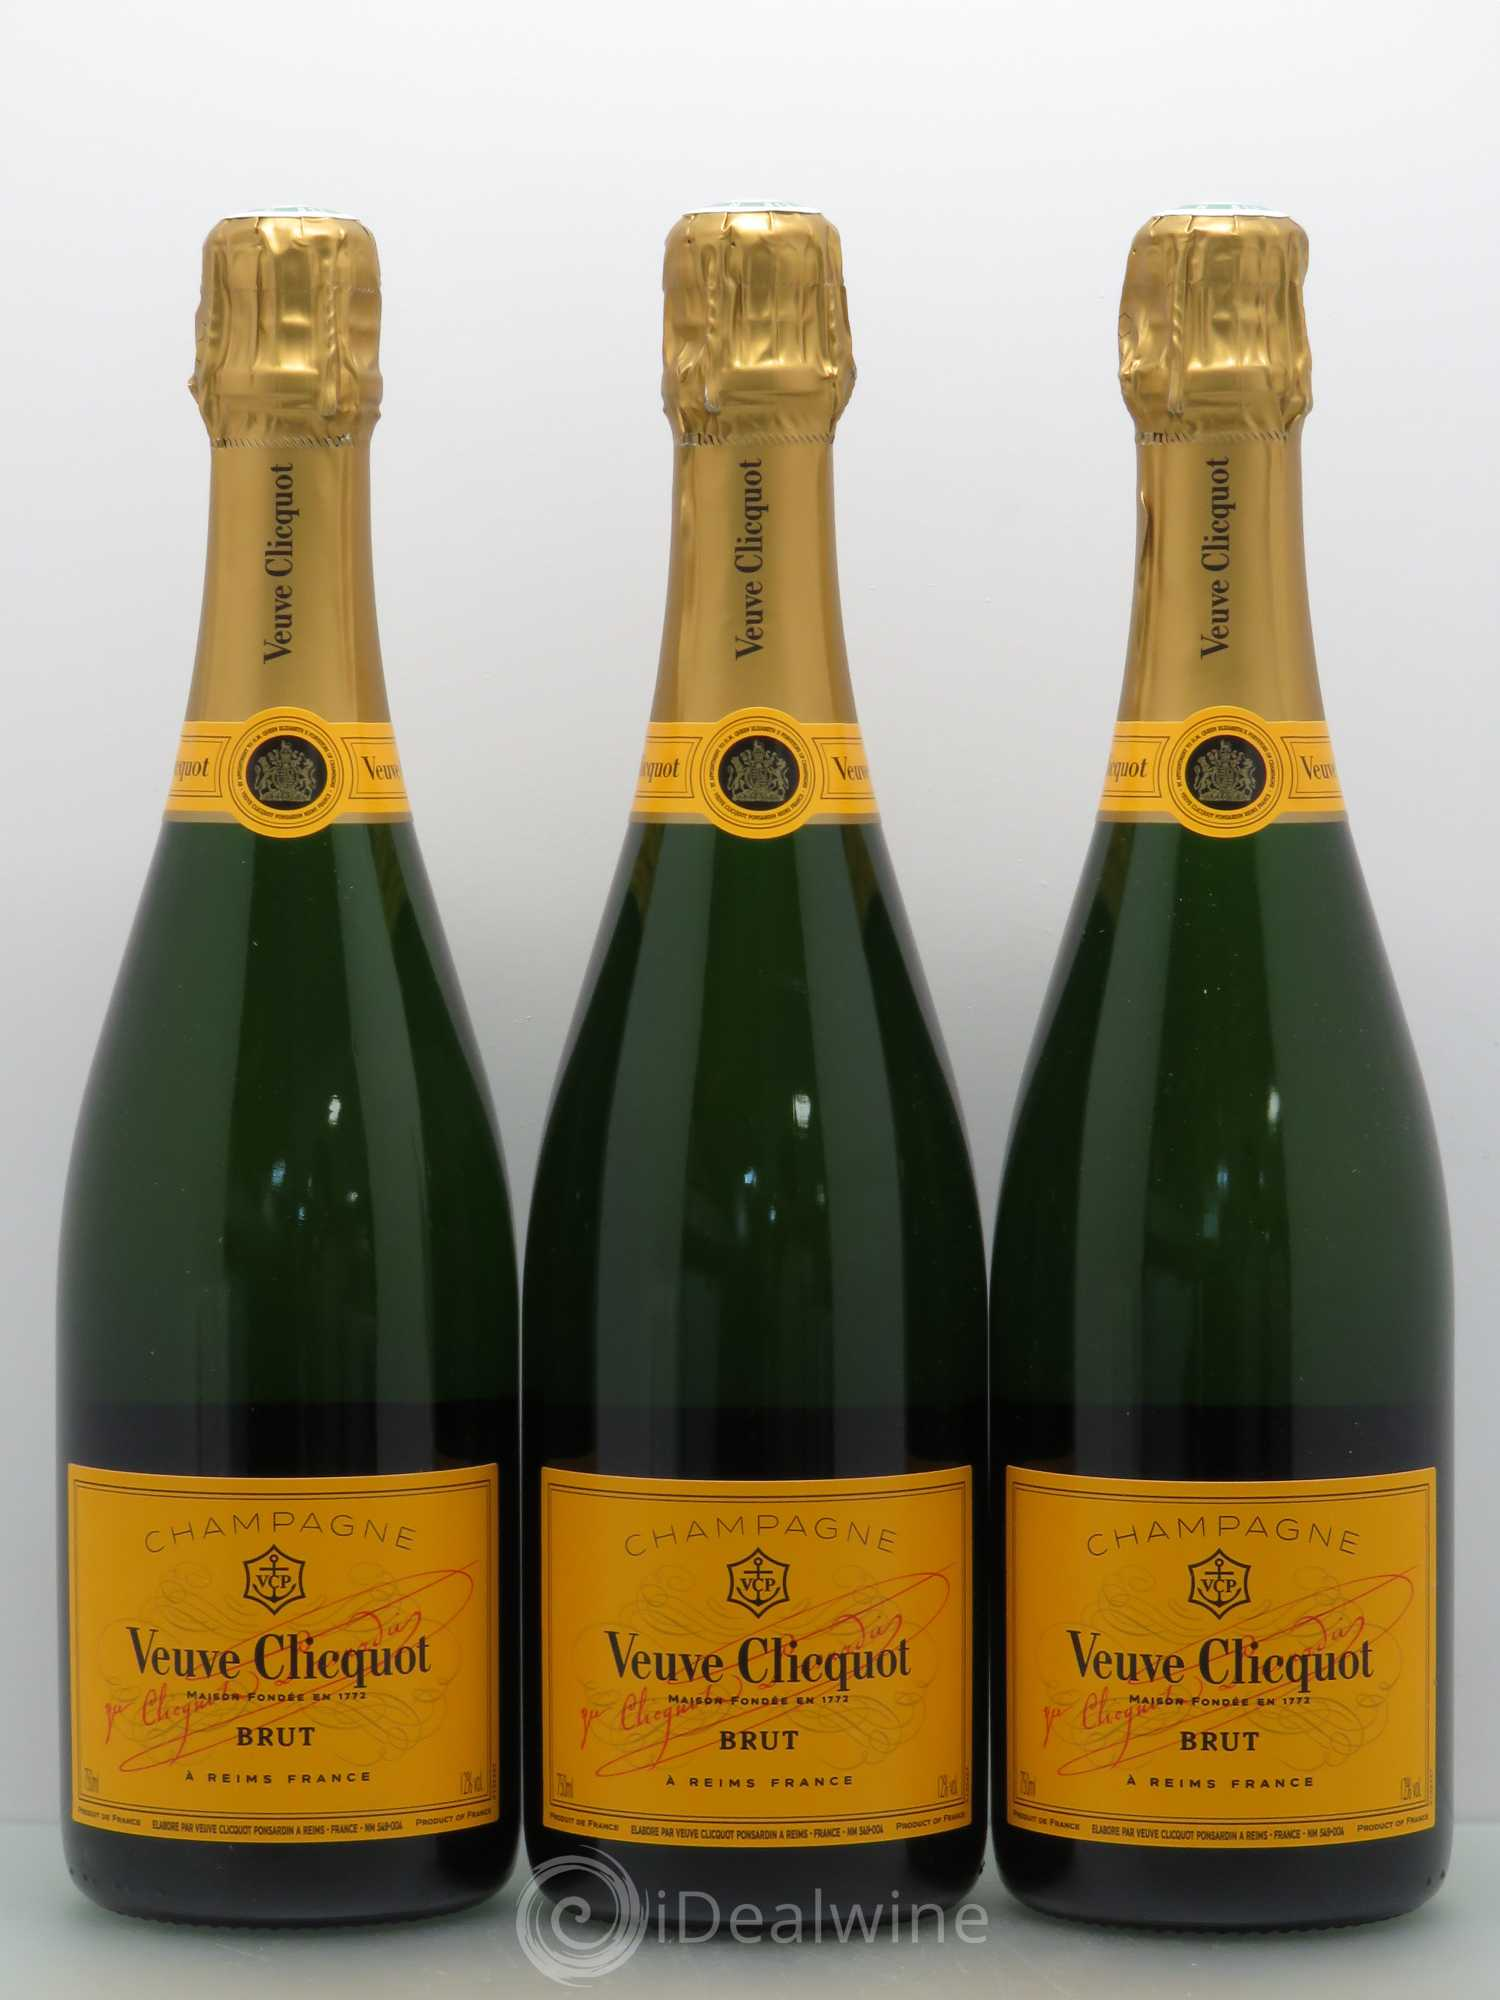 Pourquoi champagne veuve